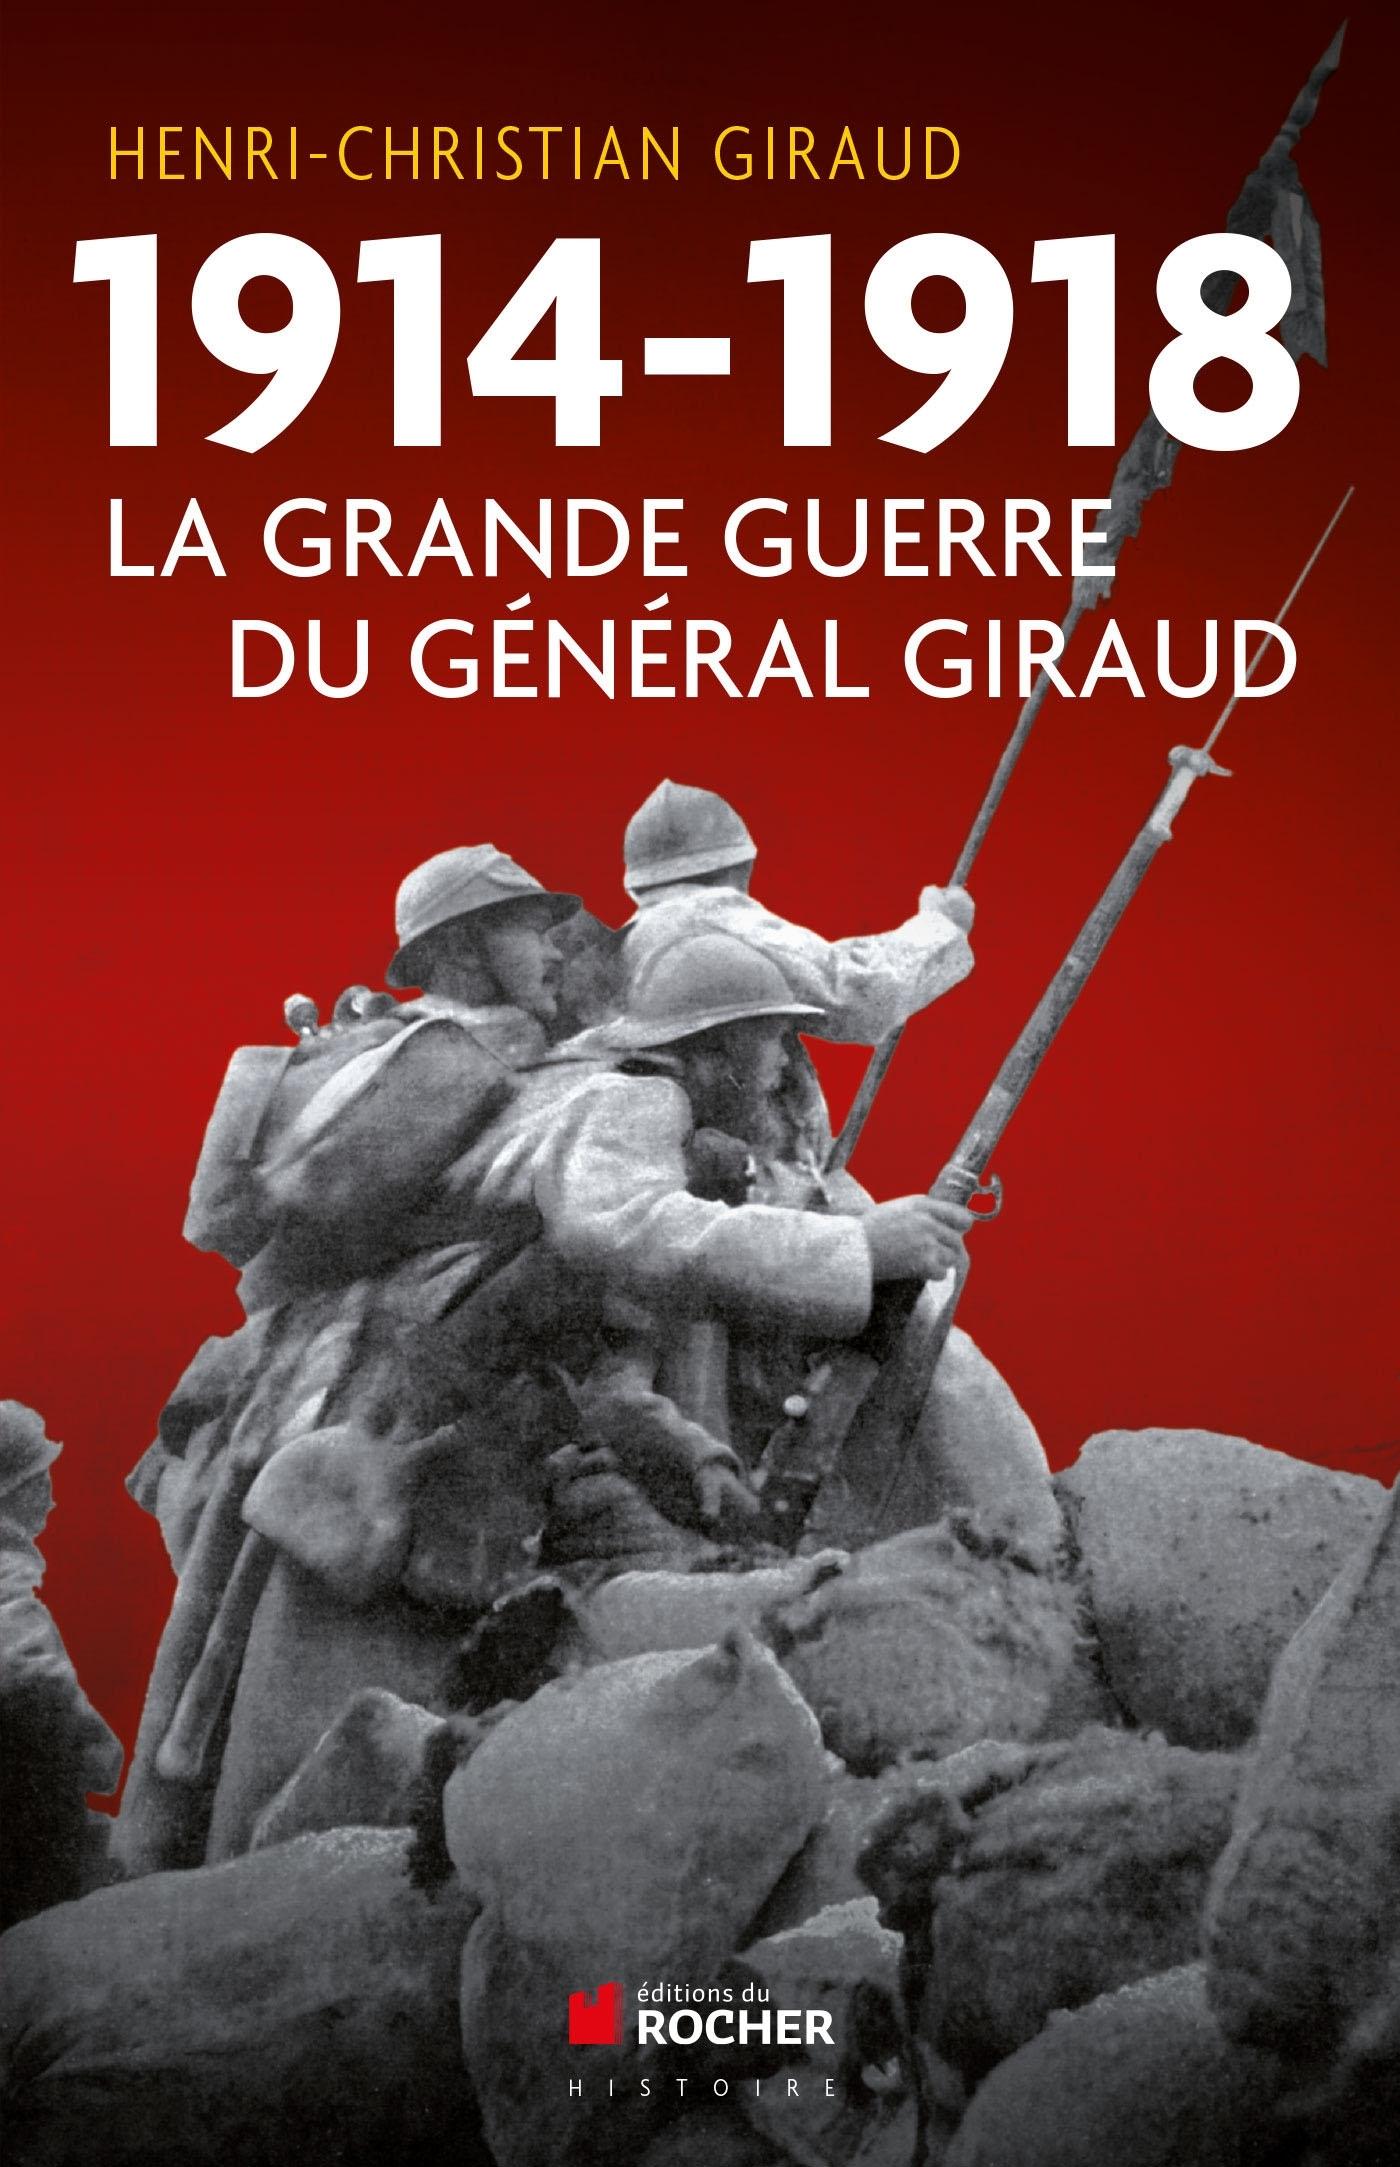 1914-1918 - LA GRANDE GUERRE DU GENERAL GIRAUD